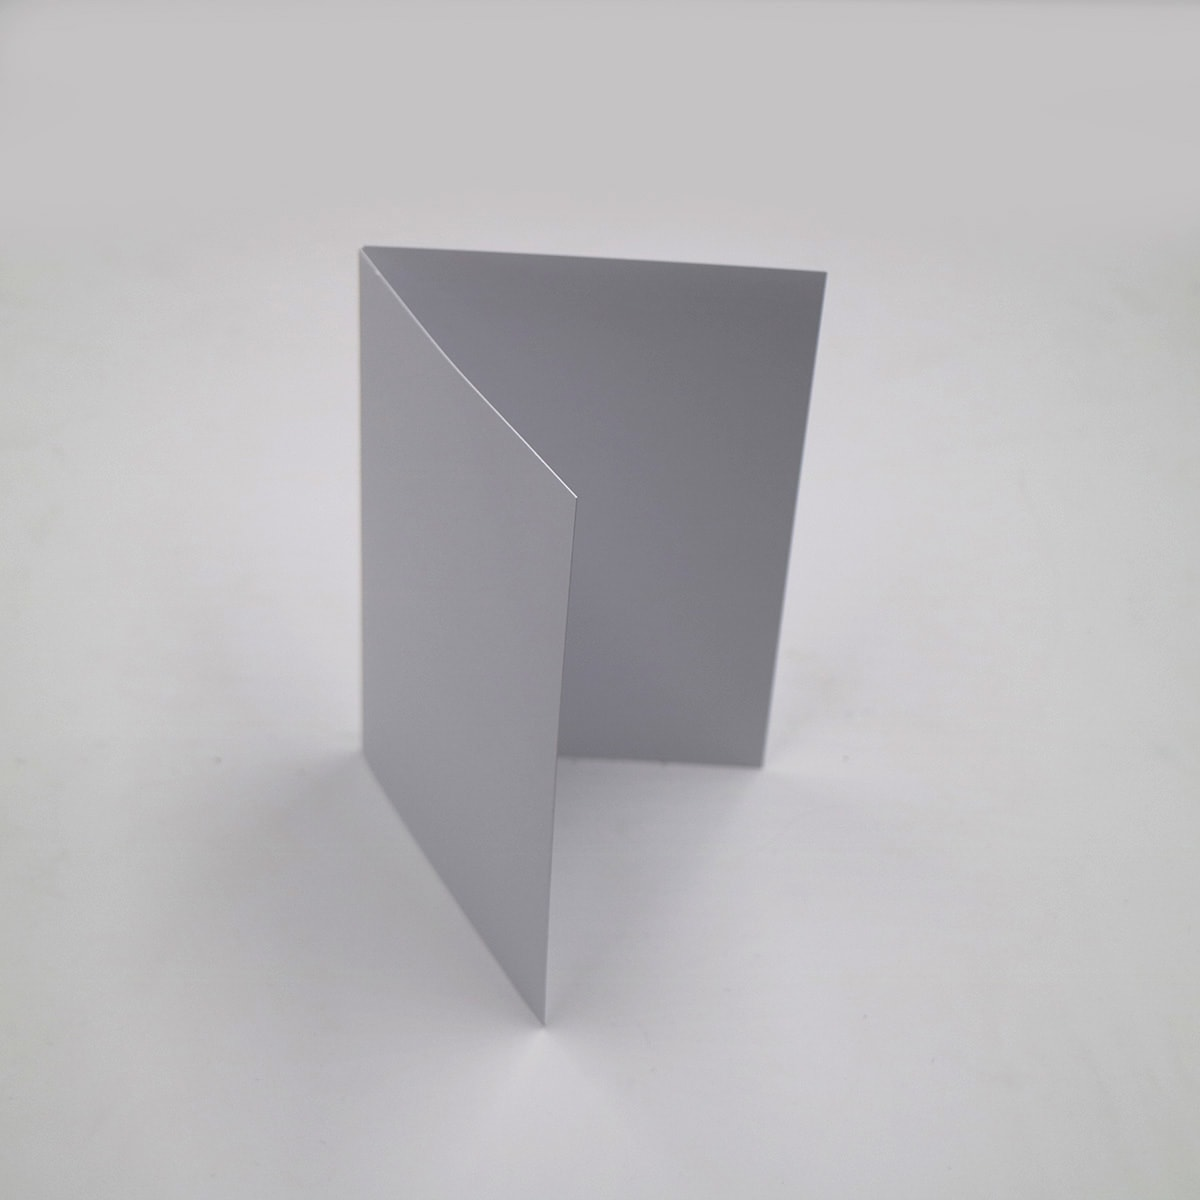 A6 WHITE FINE LINEN SINGLE FOLD CARD BLANKS 300GSM